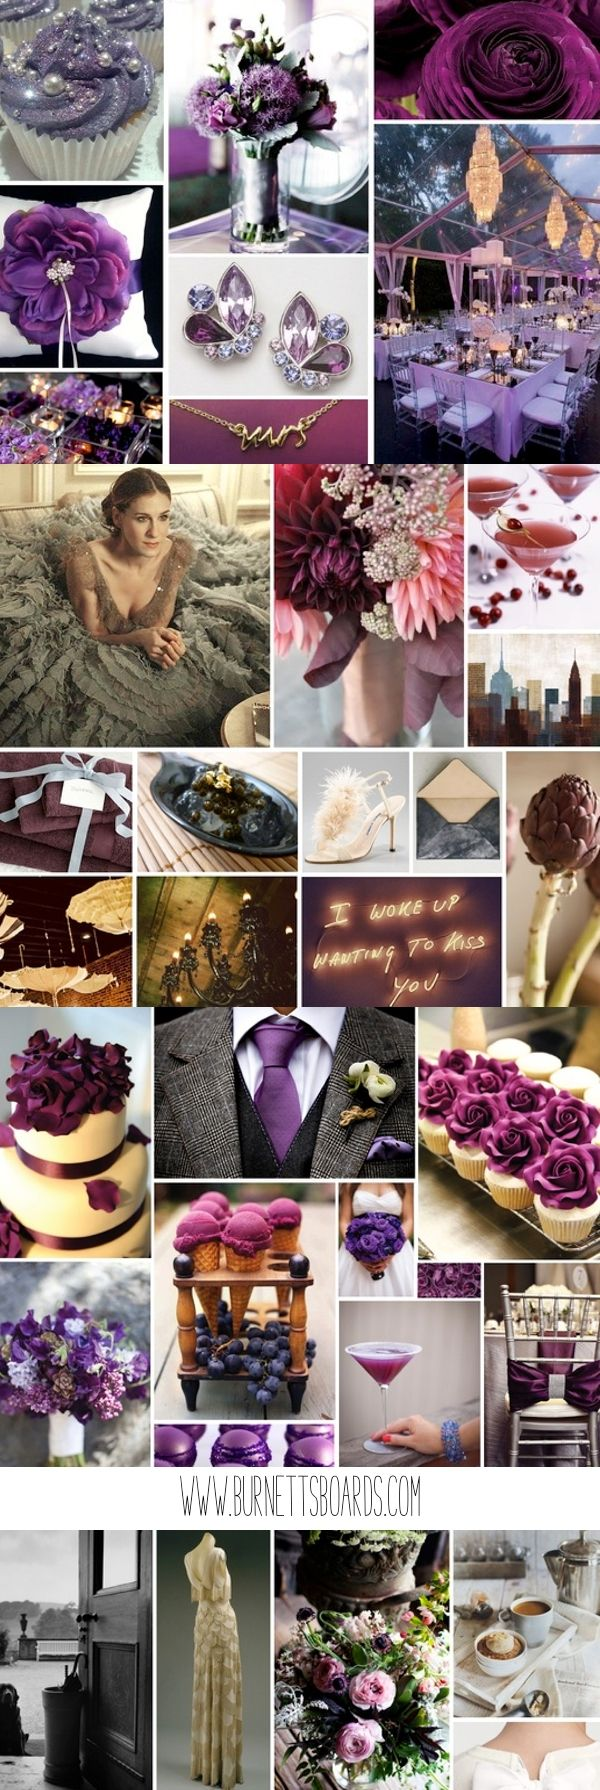 best Wedding time images on Pinterest Weddings Cake wedding